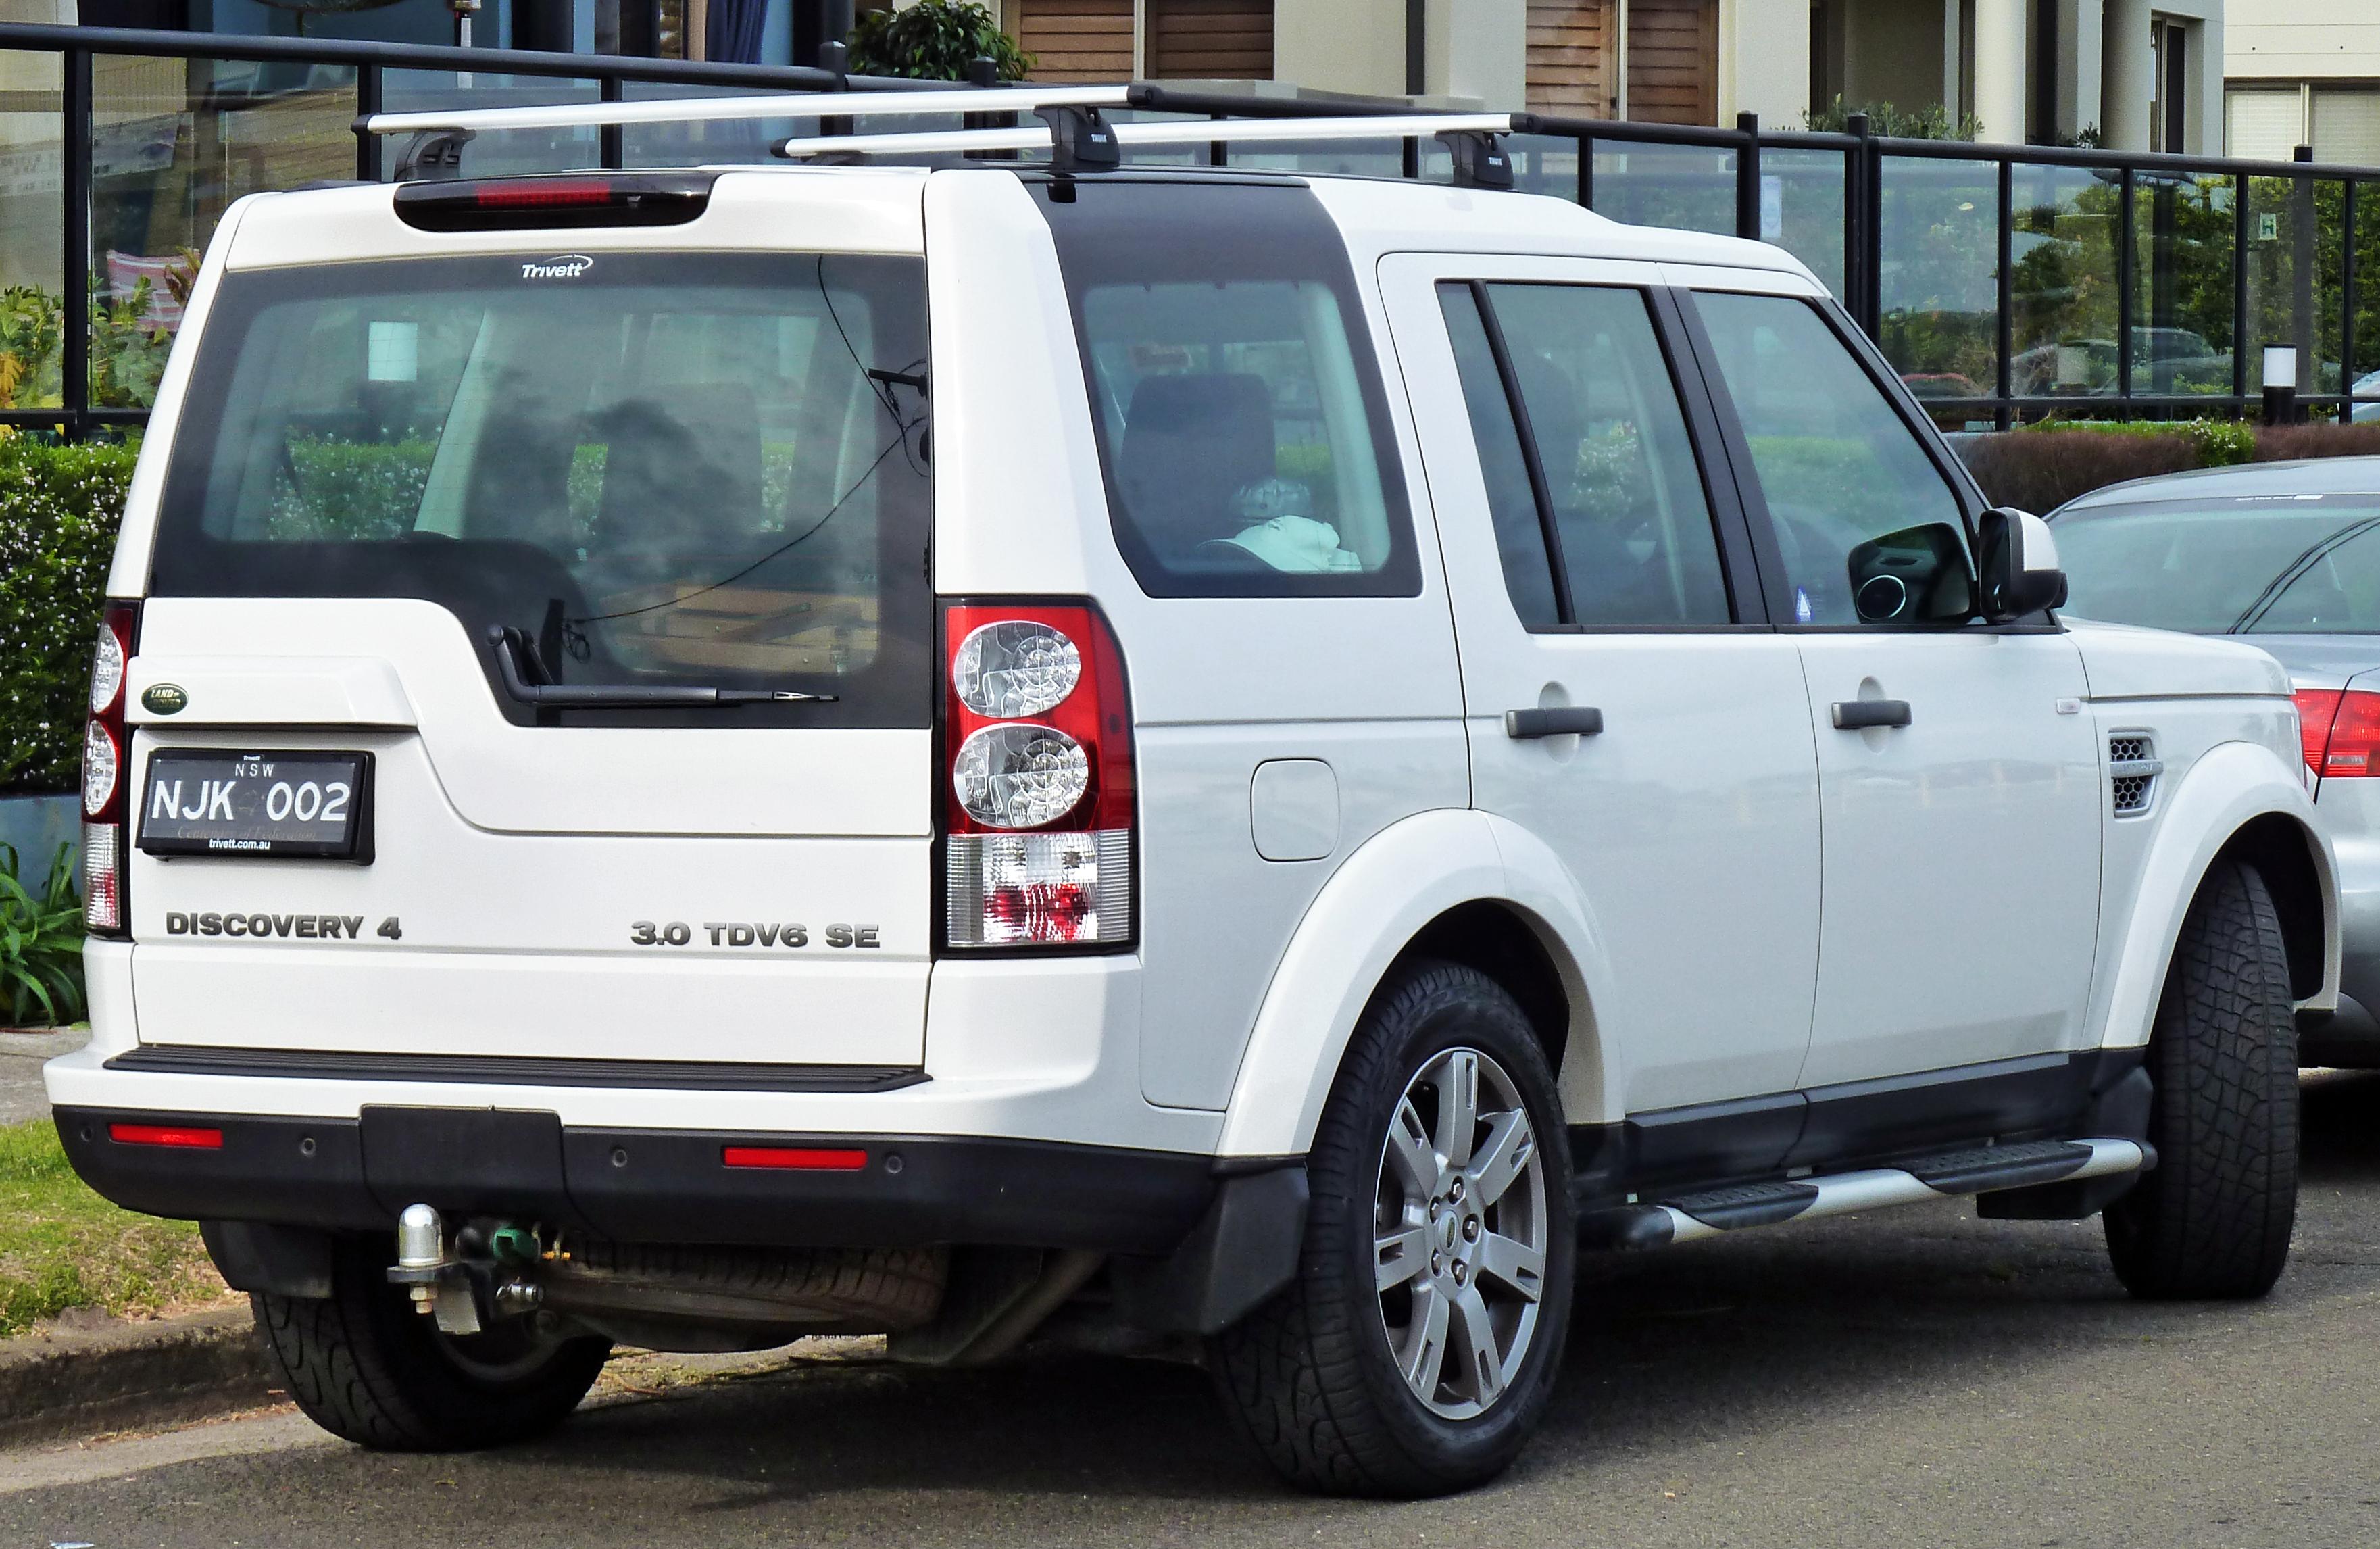 File 2009 2010 Land Rover Discovery 4 TDV6 SE wagon 02